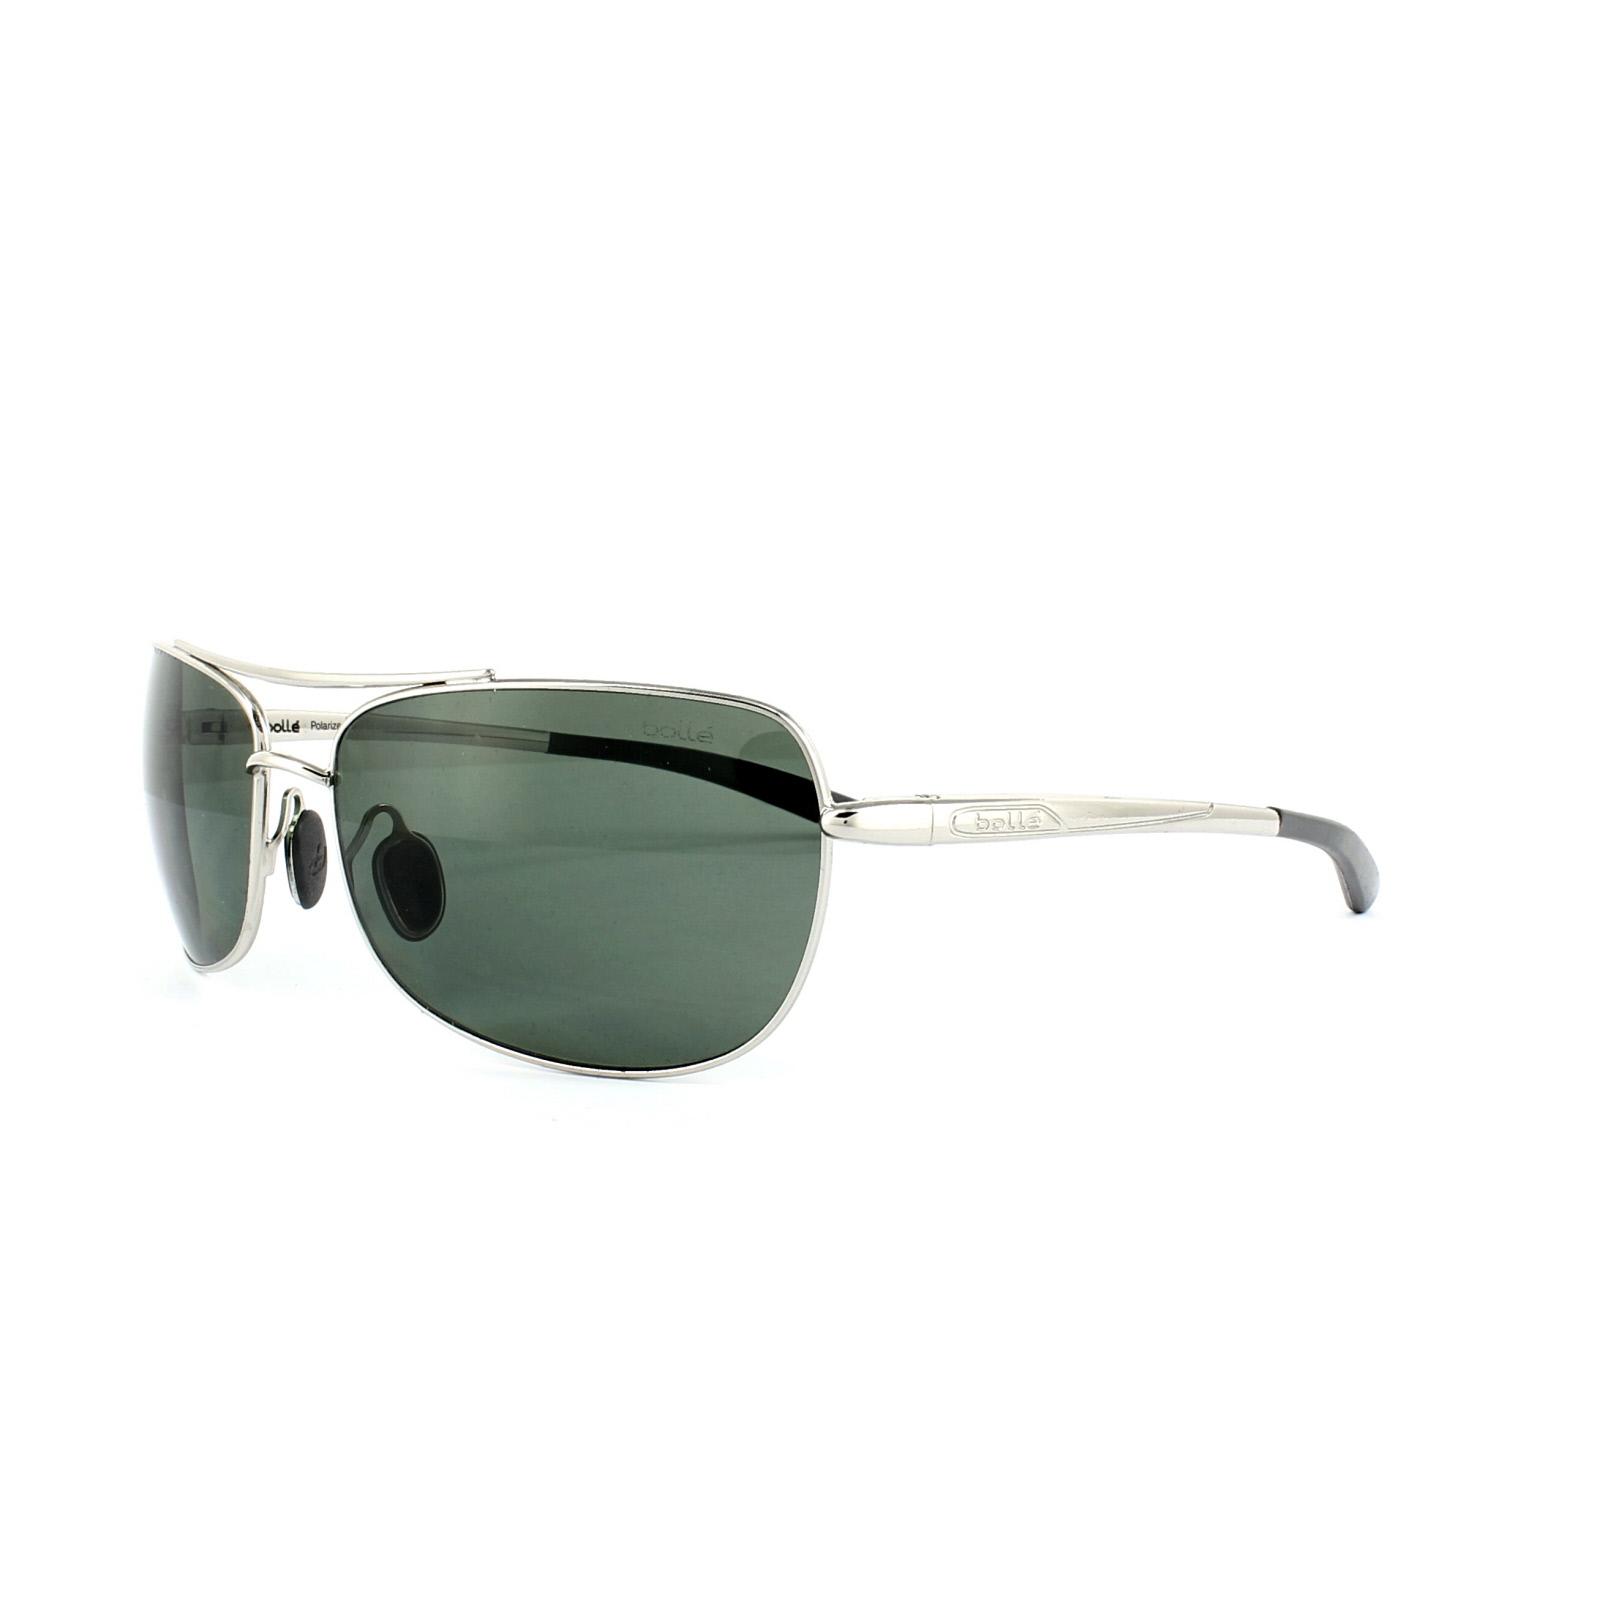 29f21df472a Ebay Bolle Polarized Sunglasses